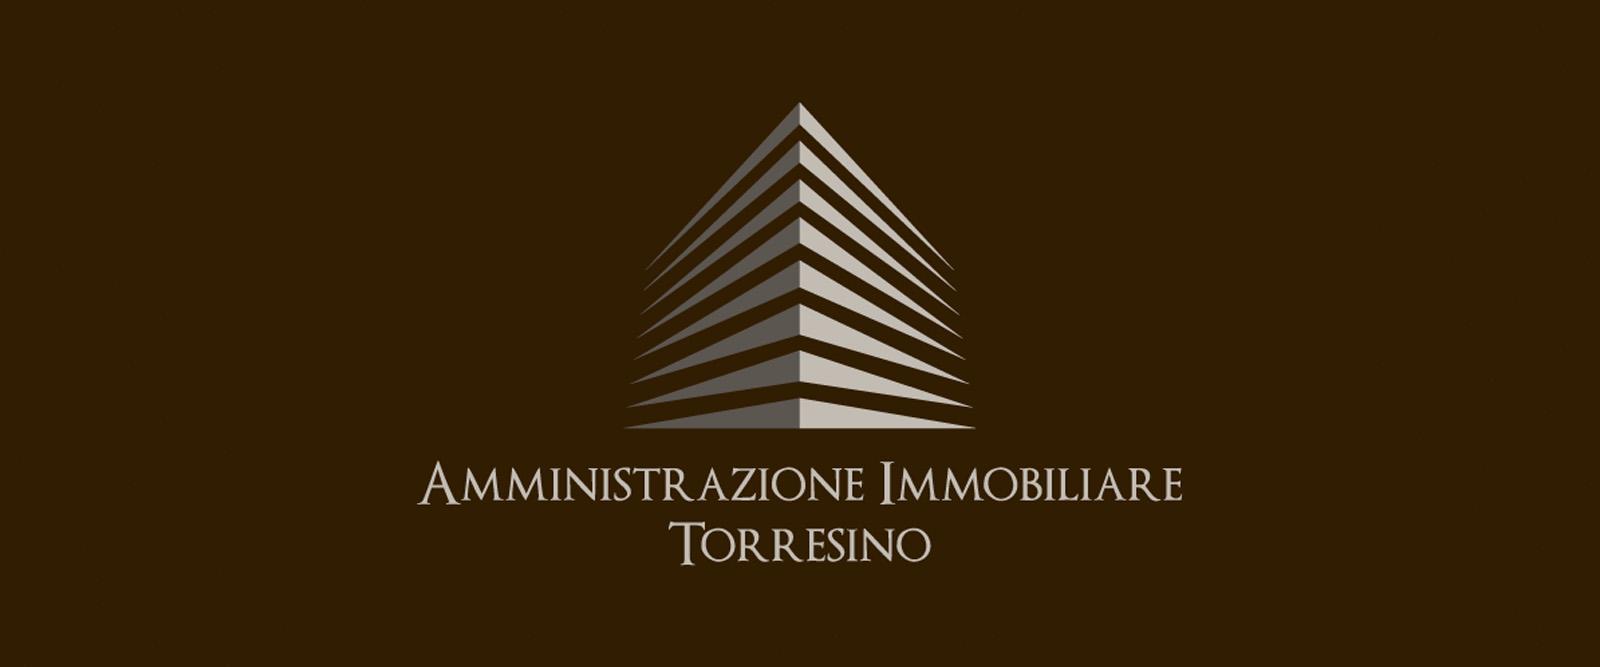 Amministrazione Torresino 1.jpg